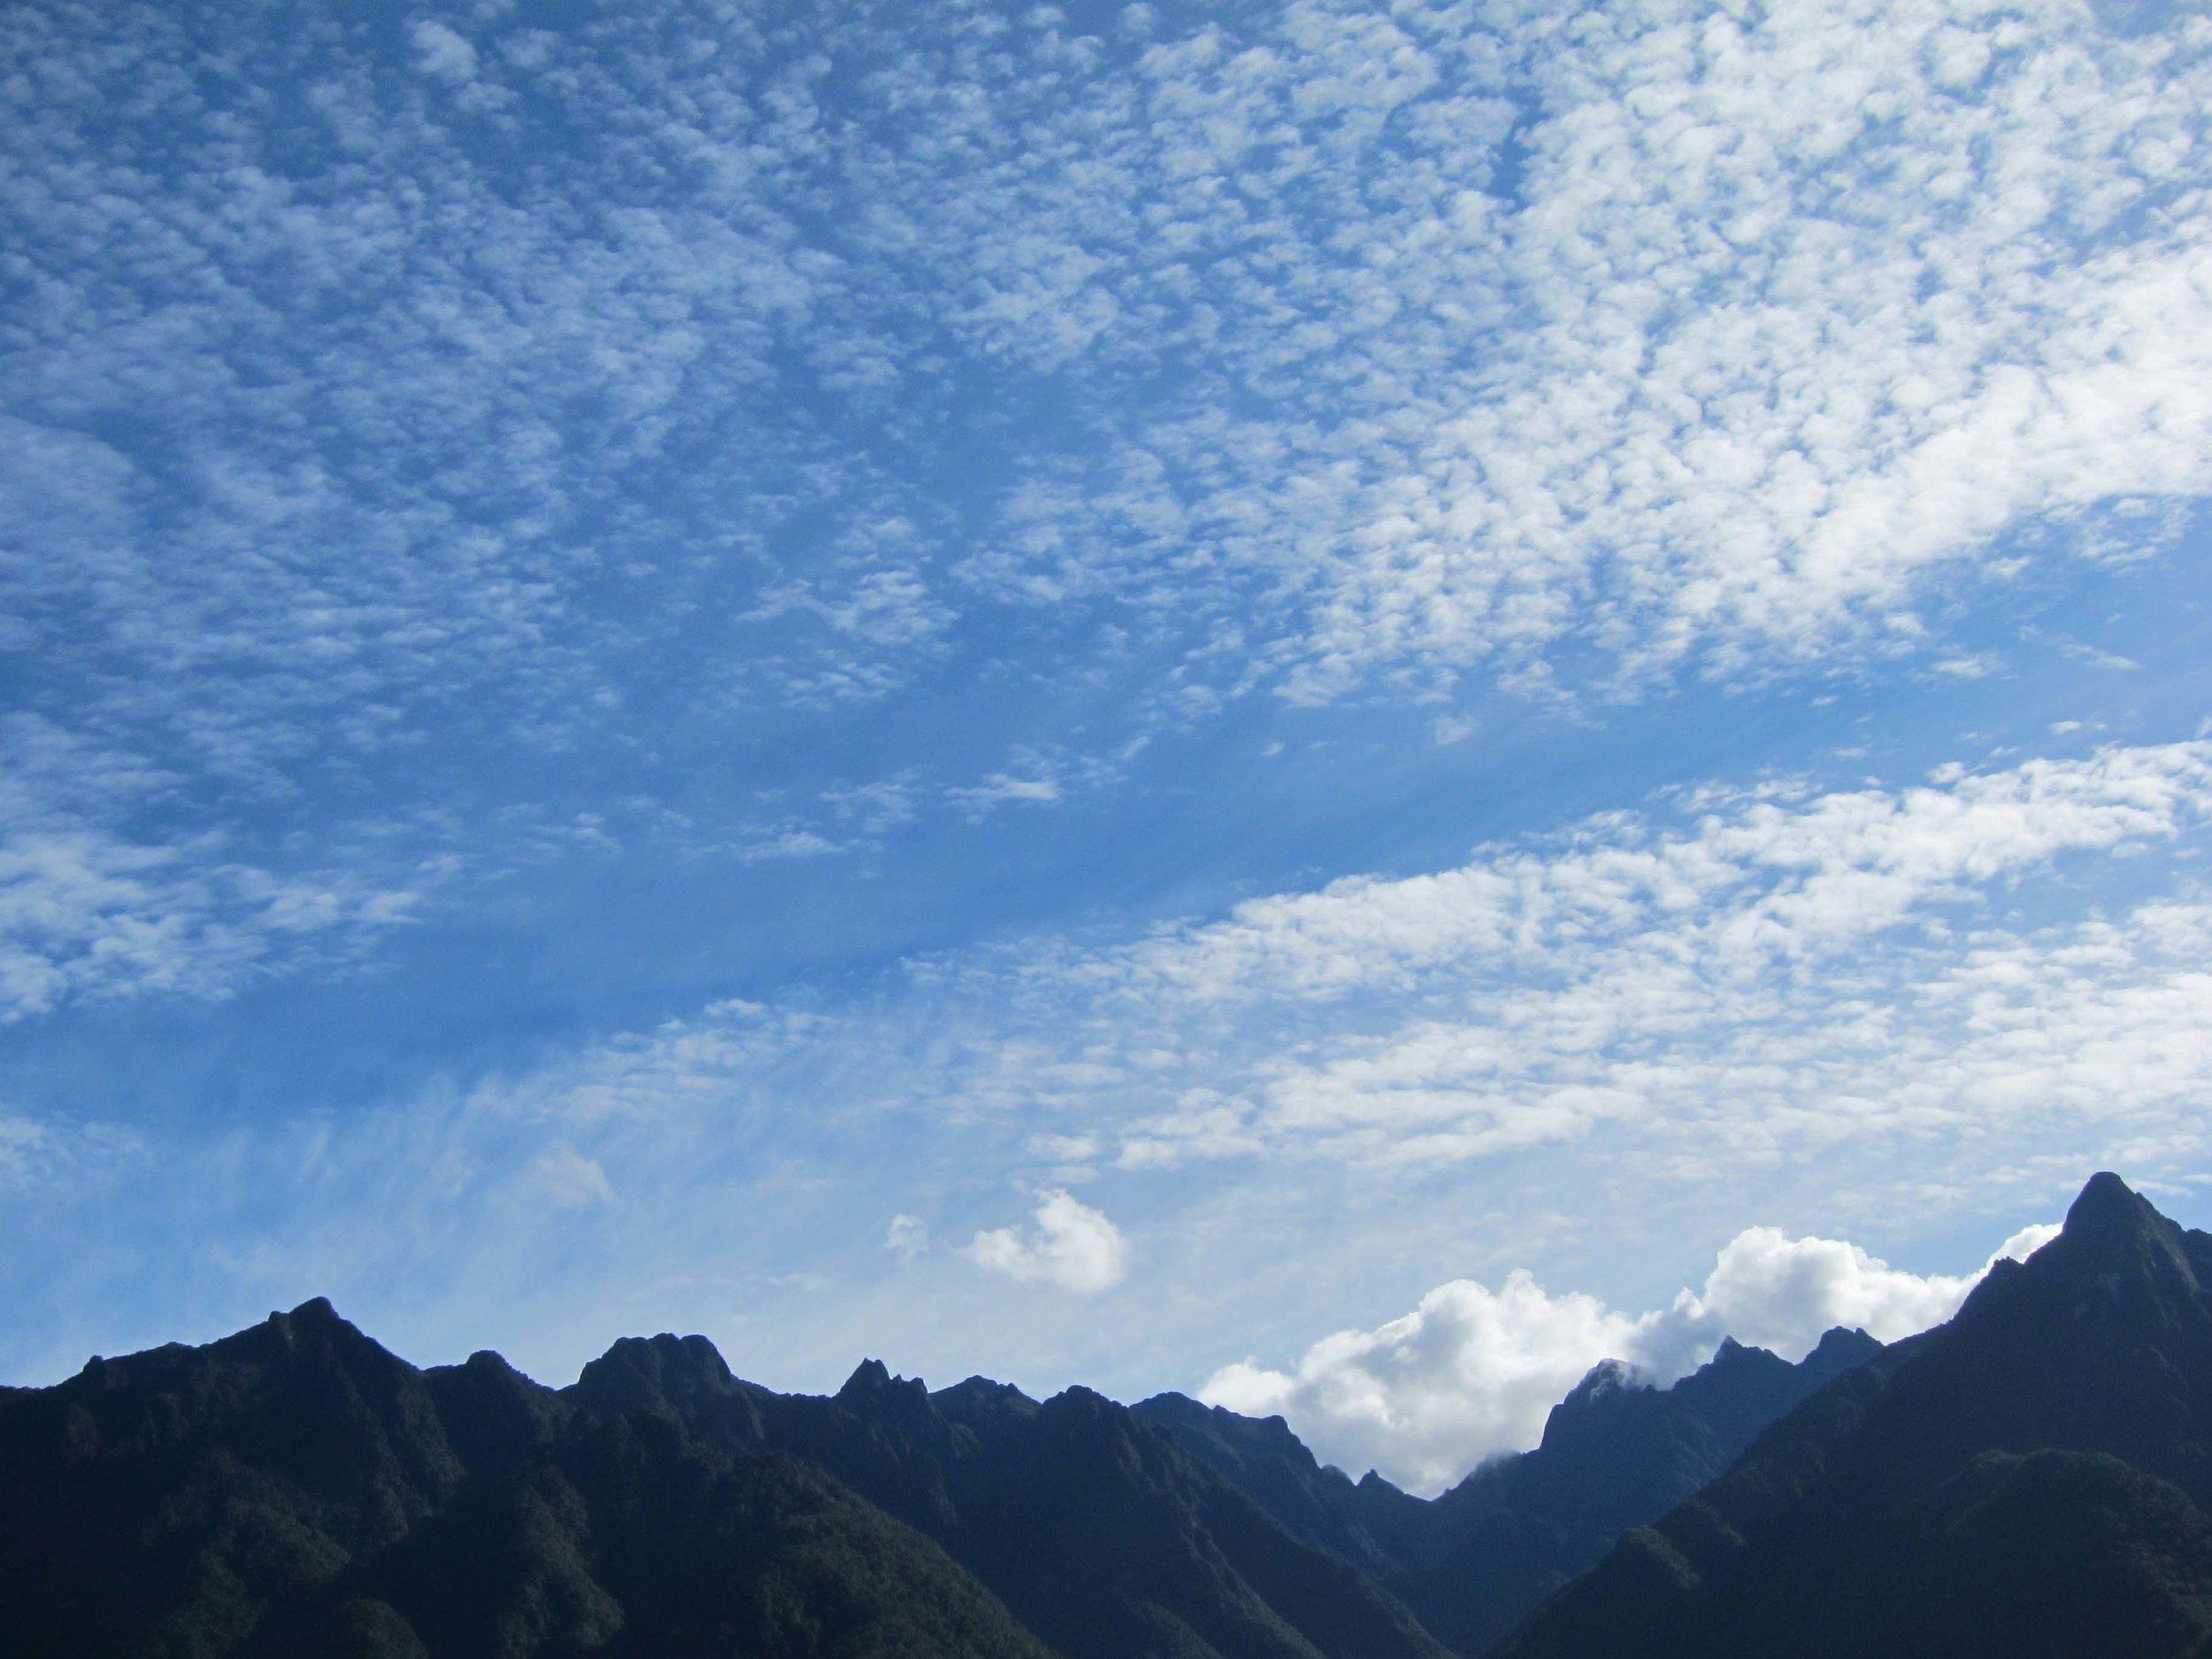 North from Machu Picchu